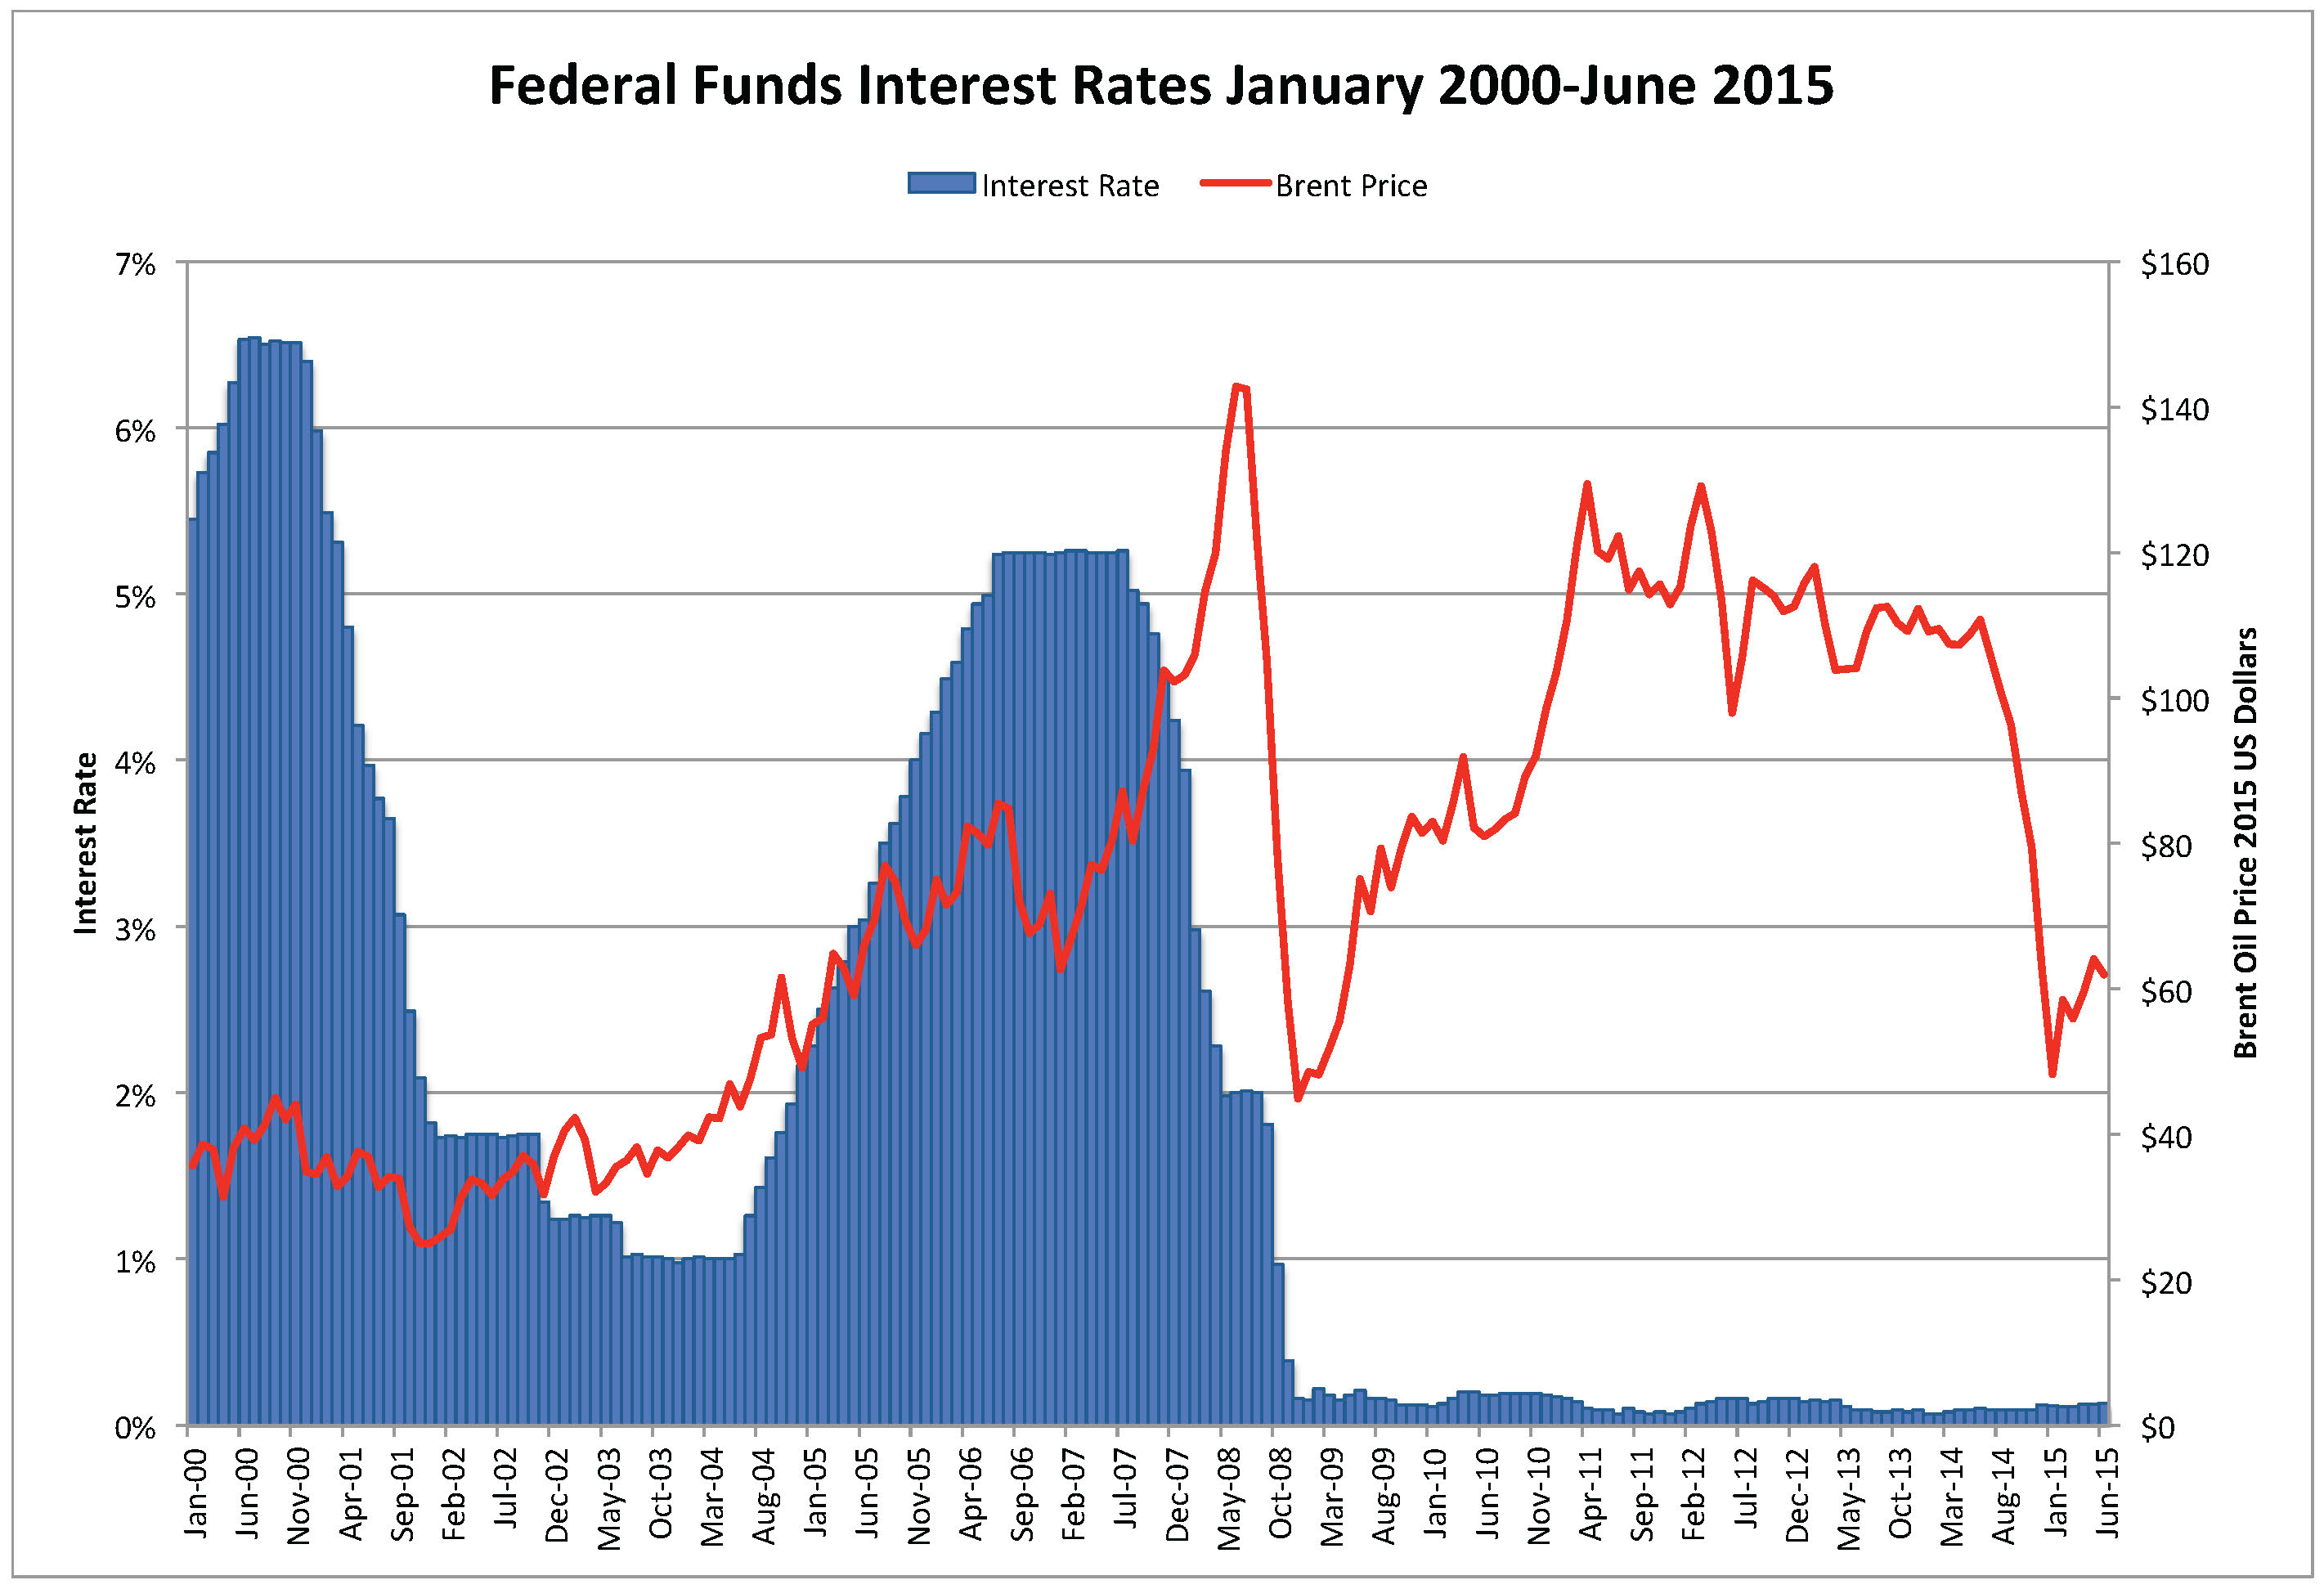 https://i1.wp.com/www.artberman.com/wp-content/uploads/Federal-Funds-Rate-CPI-Adjusted-Oil-NG-Price-June-20151.jpg